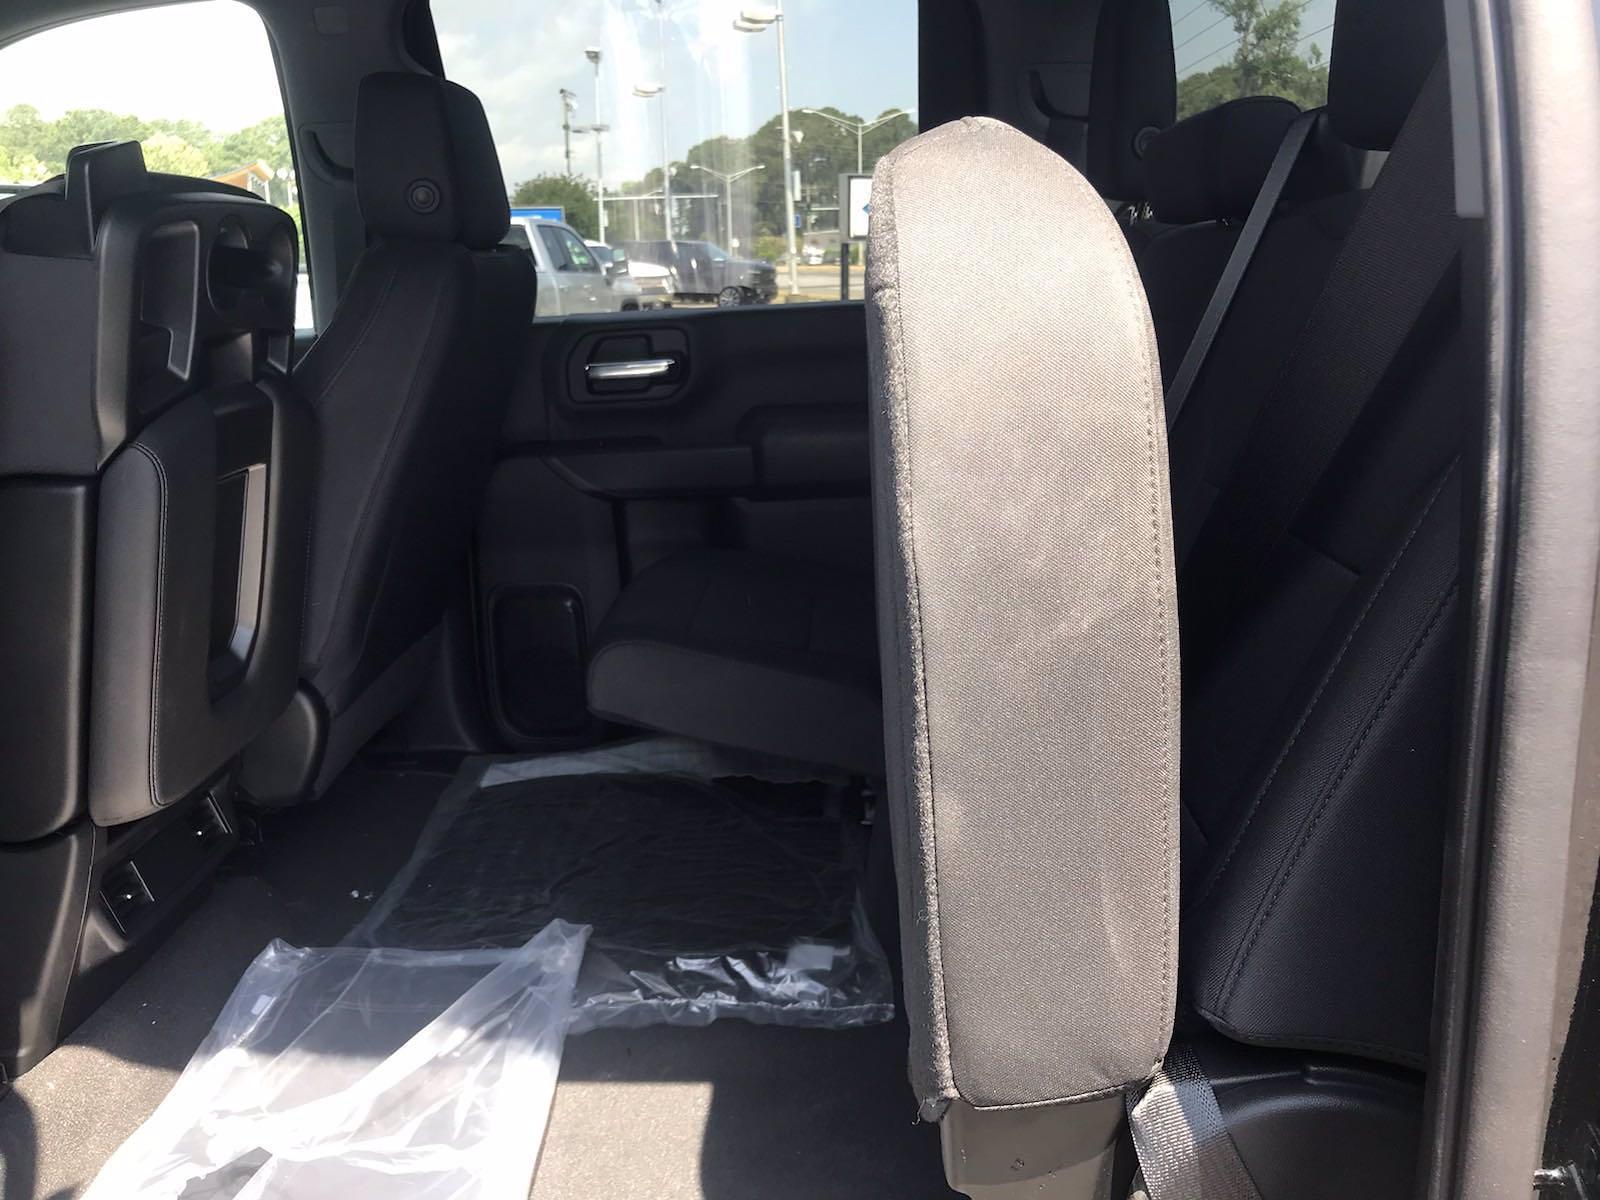 2021 Chevrolet Silverado 2500 Crew Cab 4x4, Pickup #217330 - photo 39